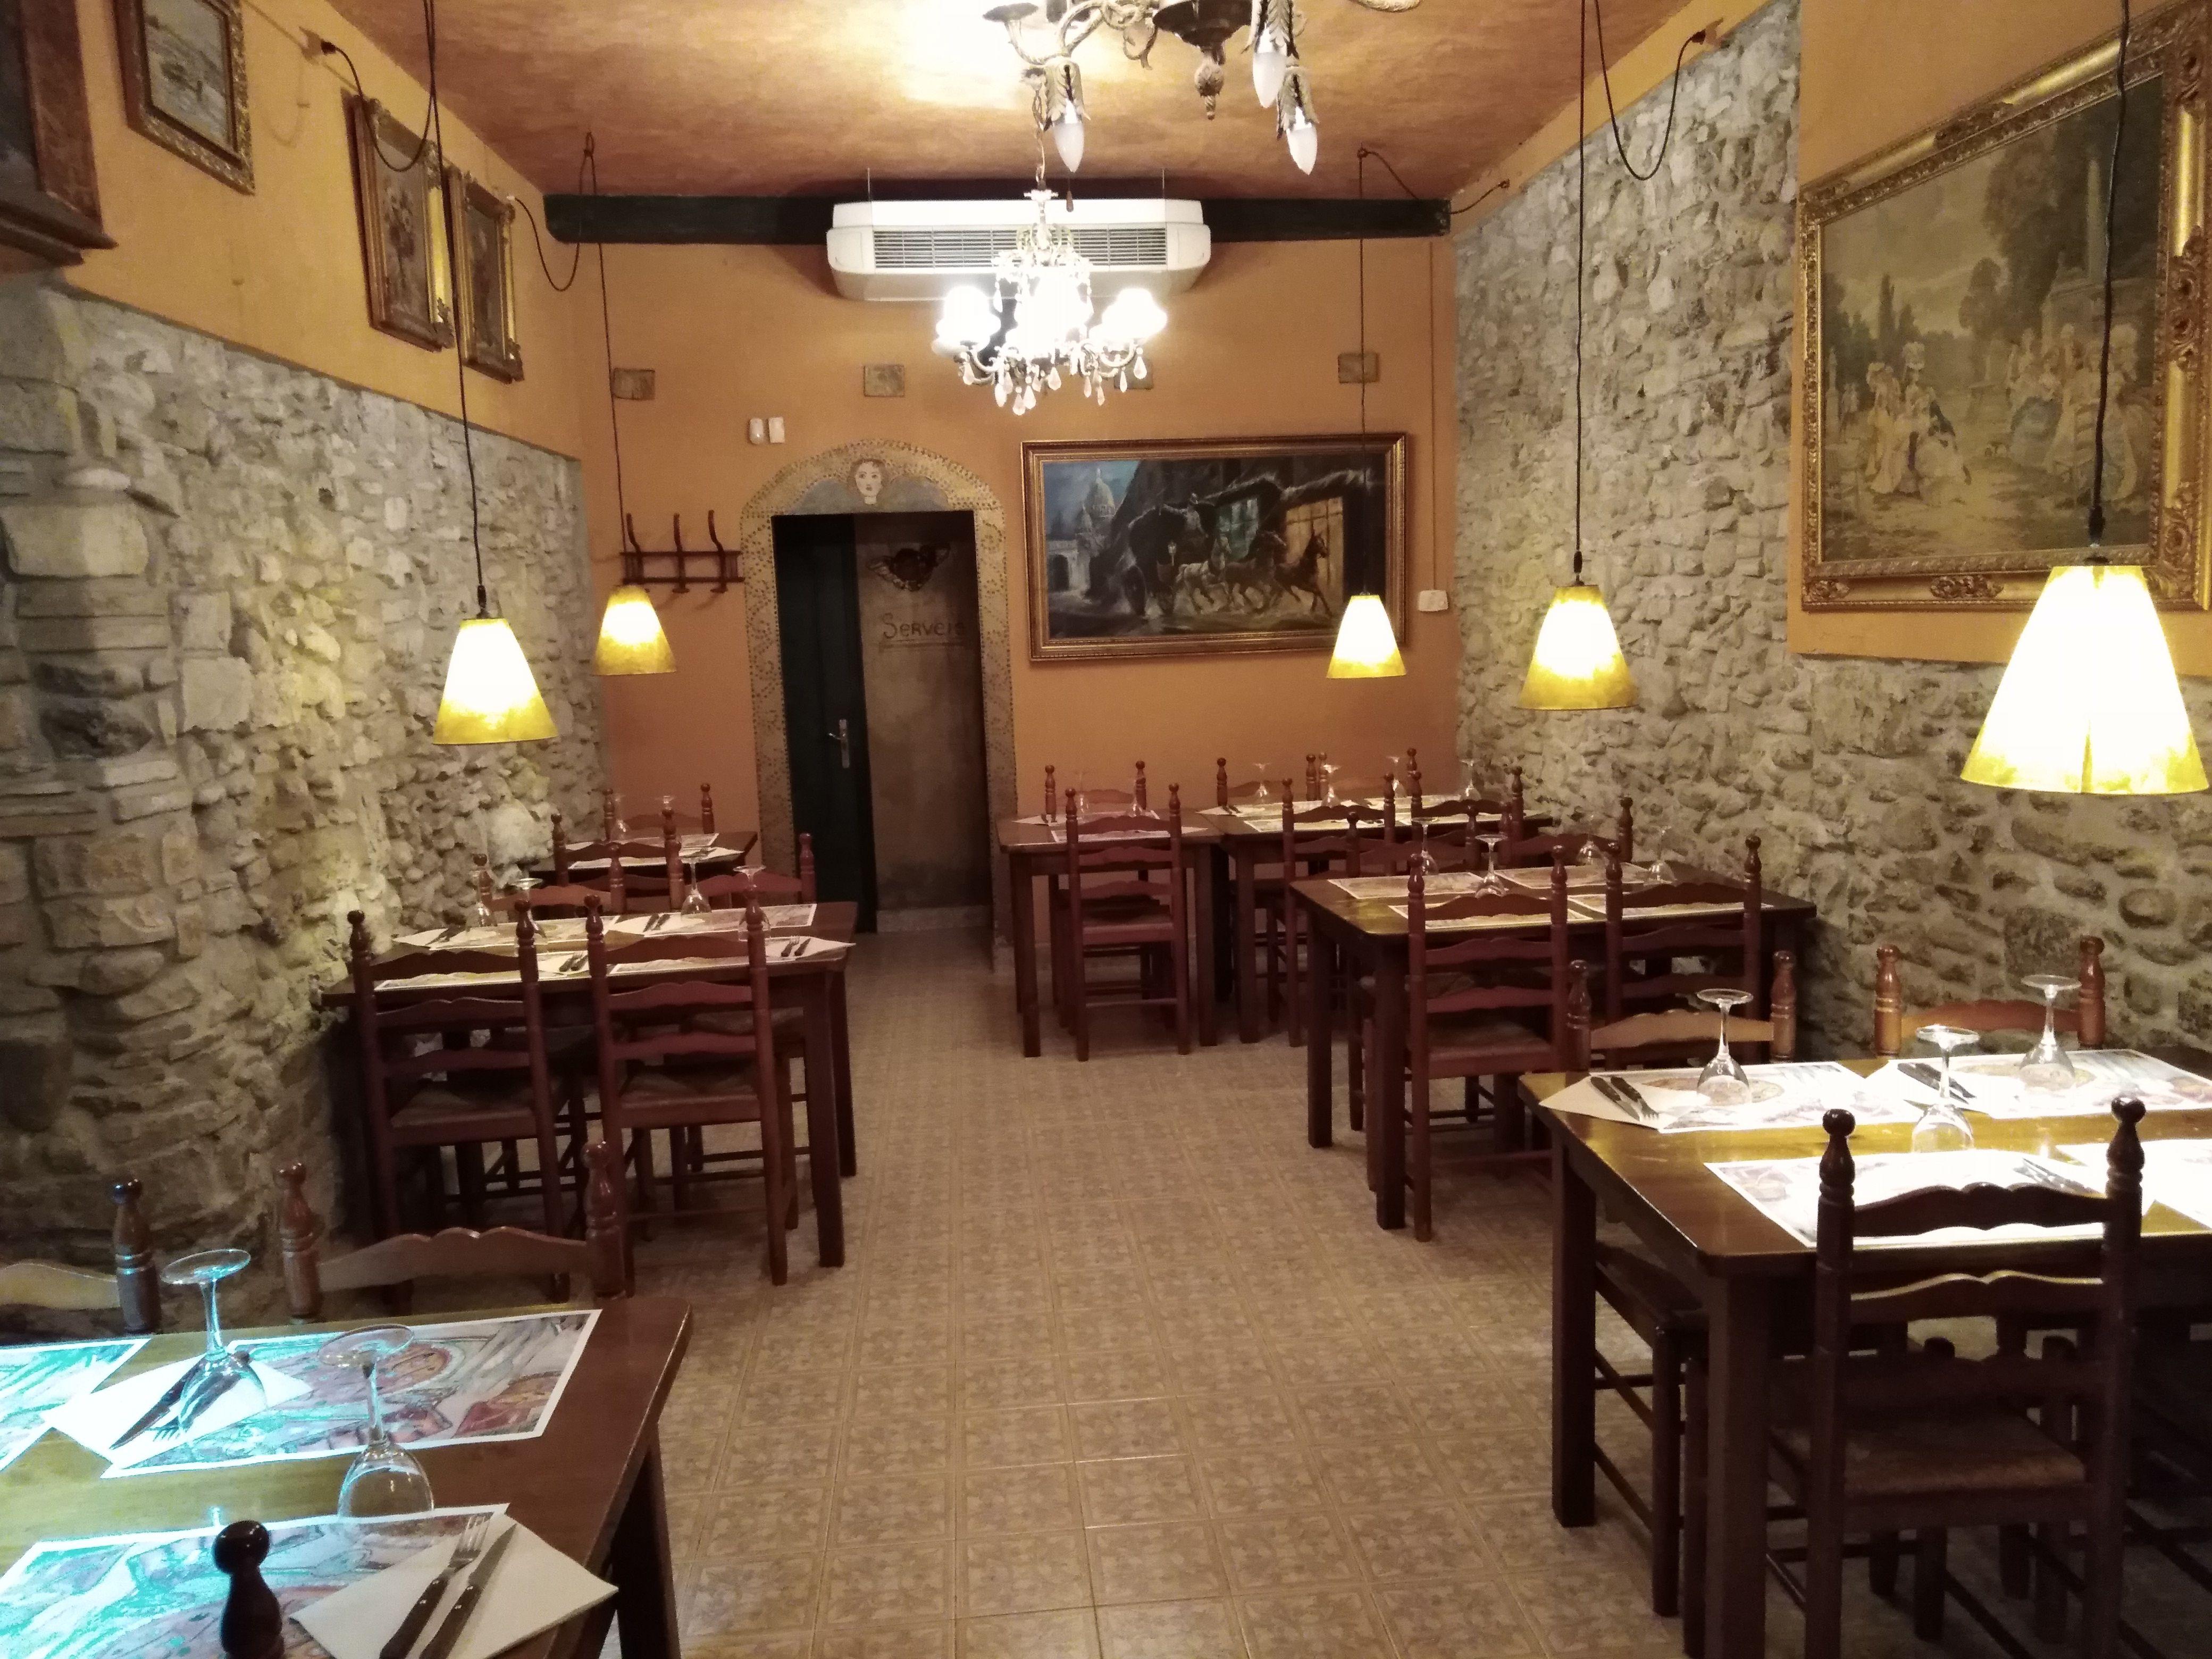 Foto 5 de Pizzerías en  | Barocchetto, il Ristorante Pizzería